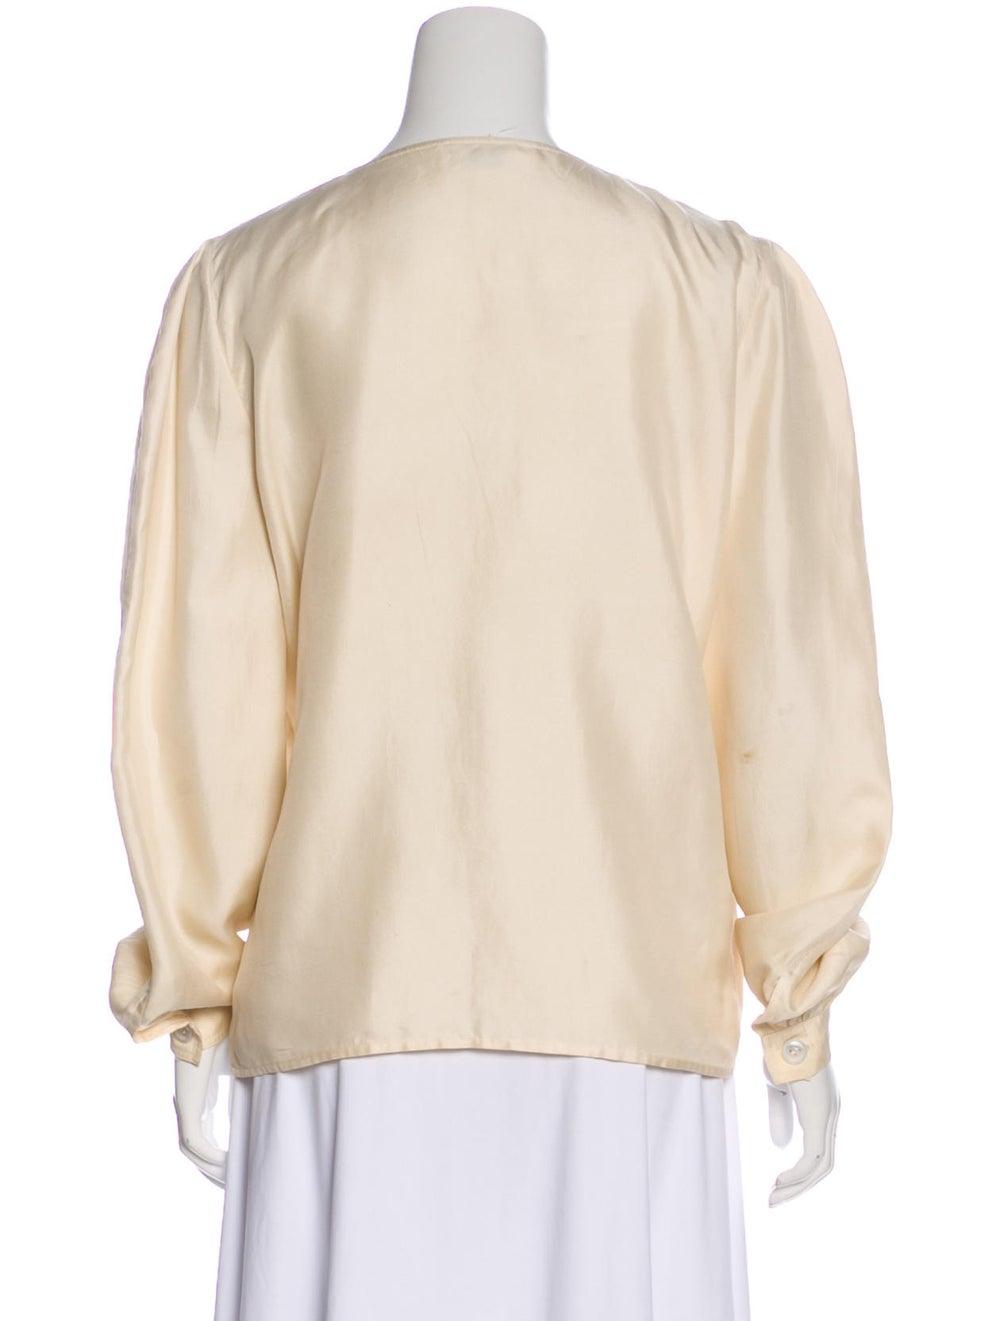 Valentino Silk Long Sleeve Blouse - image 3